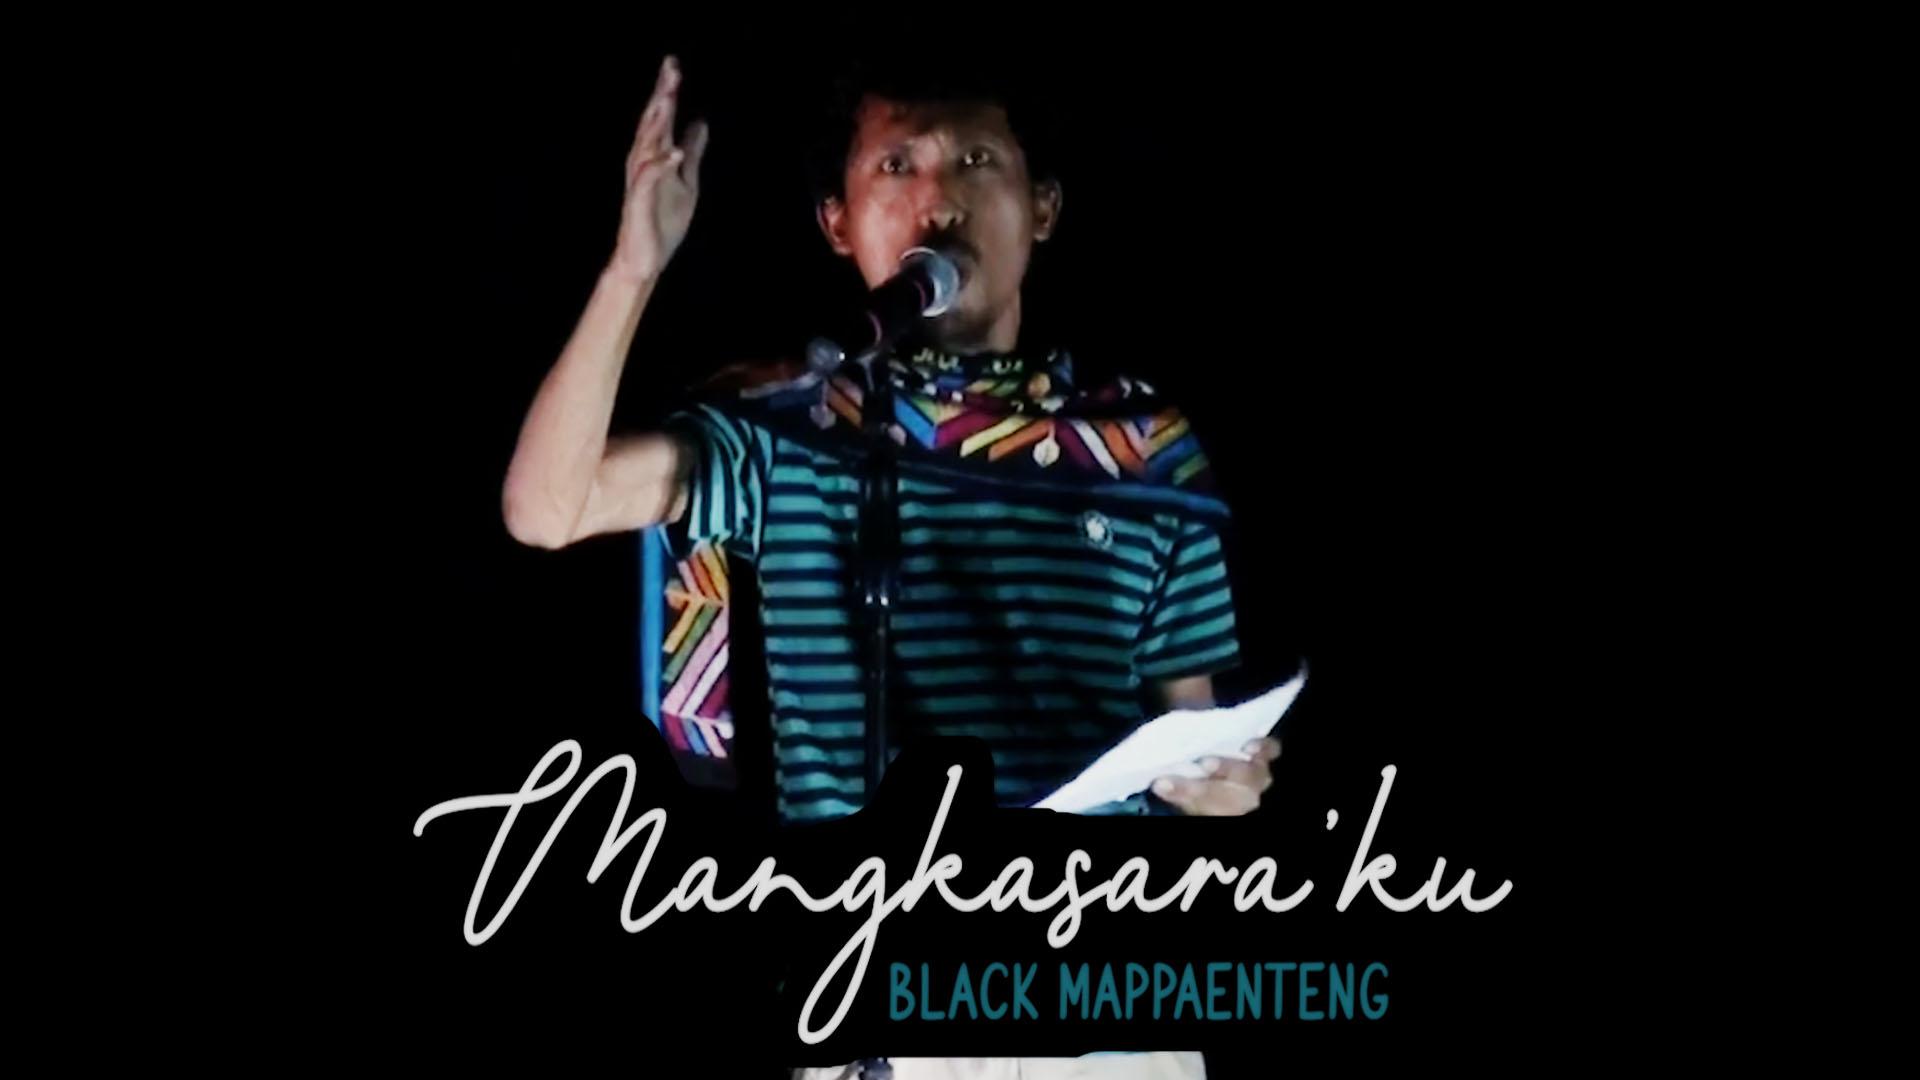 Puisi Mangkasara'ku karya Black Mappaenteng